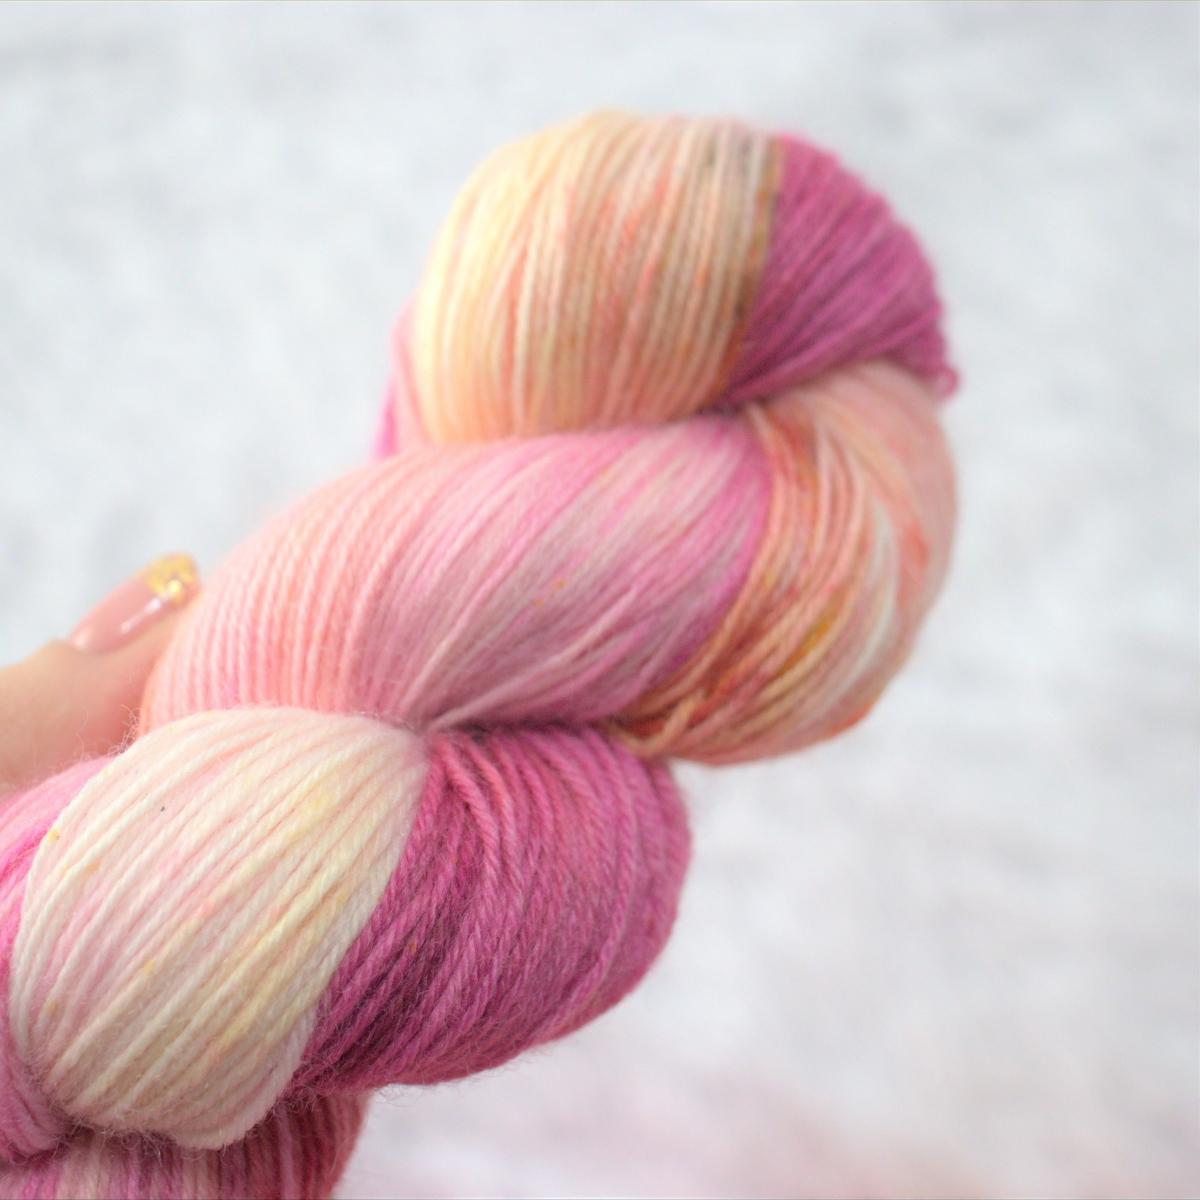 woodico.pro hand dyed yarn 053 2 1200x1200 - Hand dyed yarn / 053